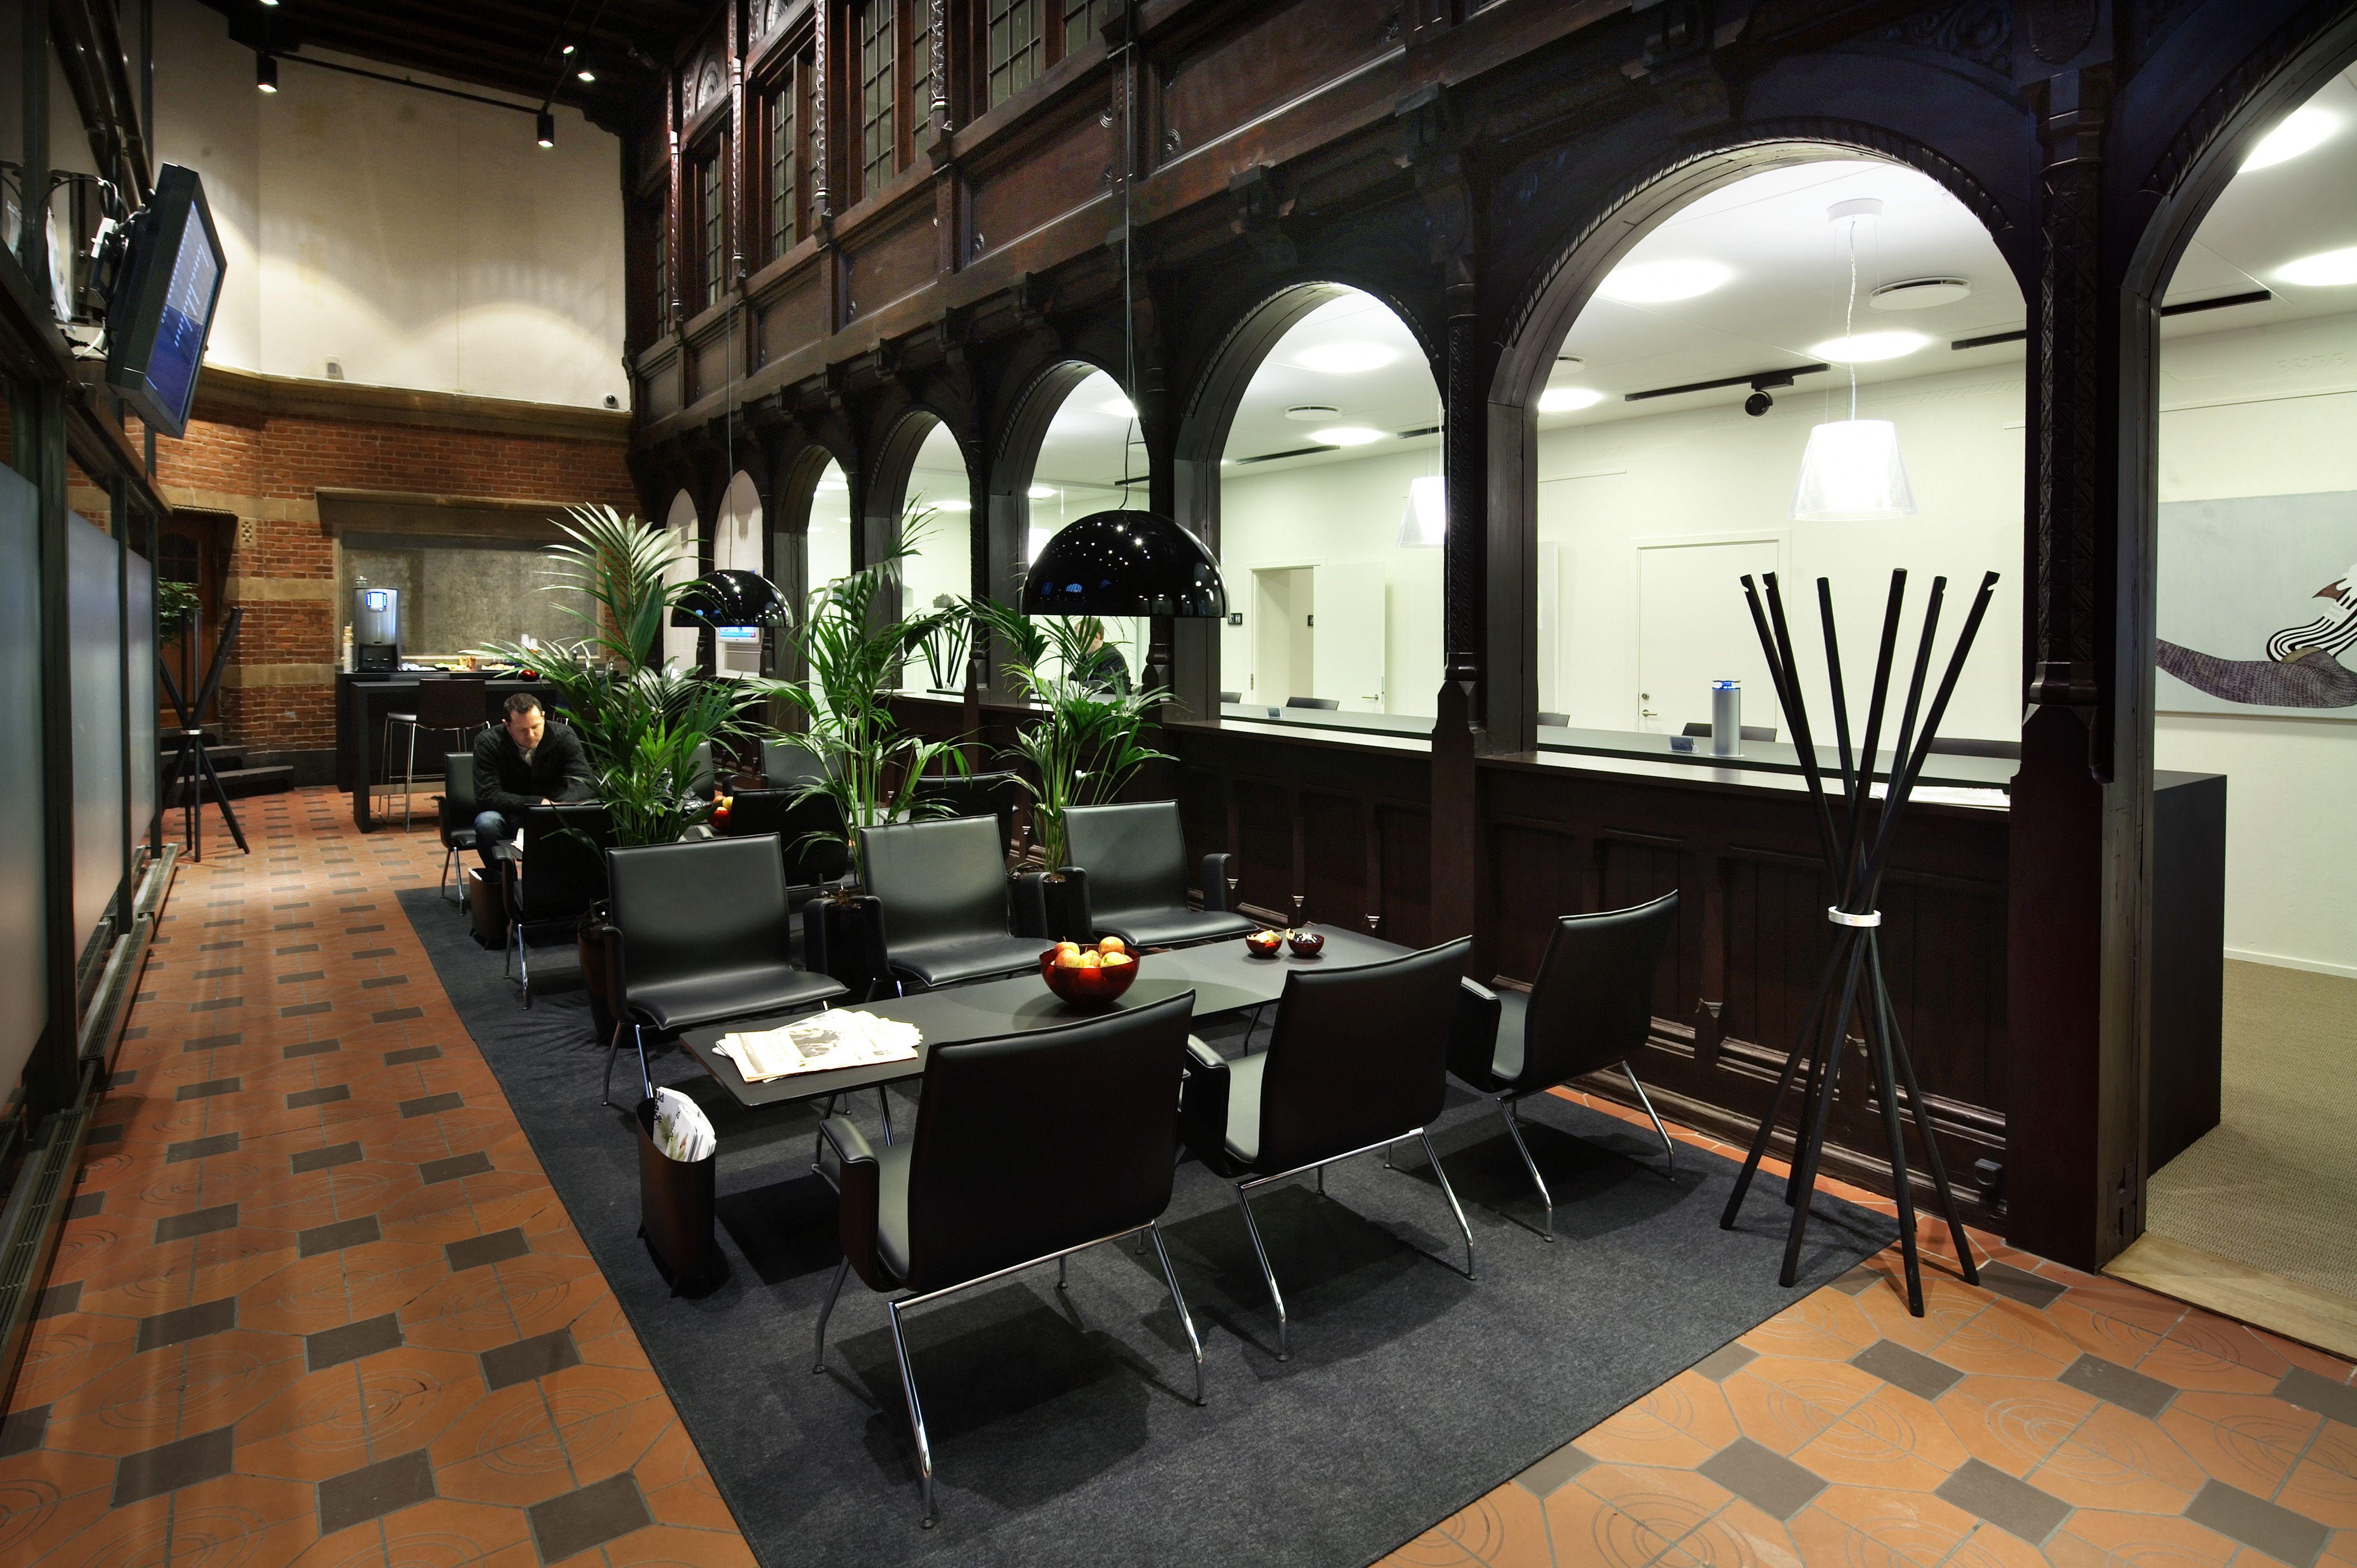 dsb lounge hovedbanegrden po inventar desktop furniture linoleum forbo interior - Linoleum Restaurant Interior